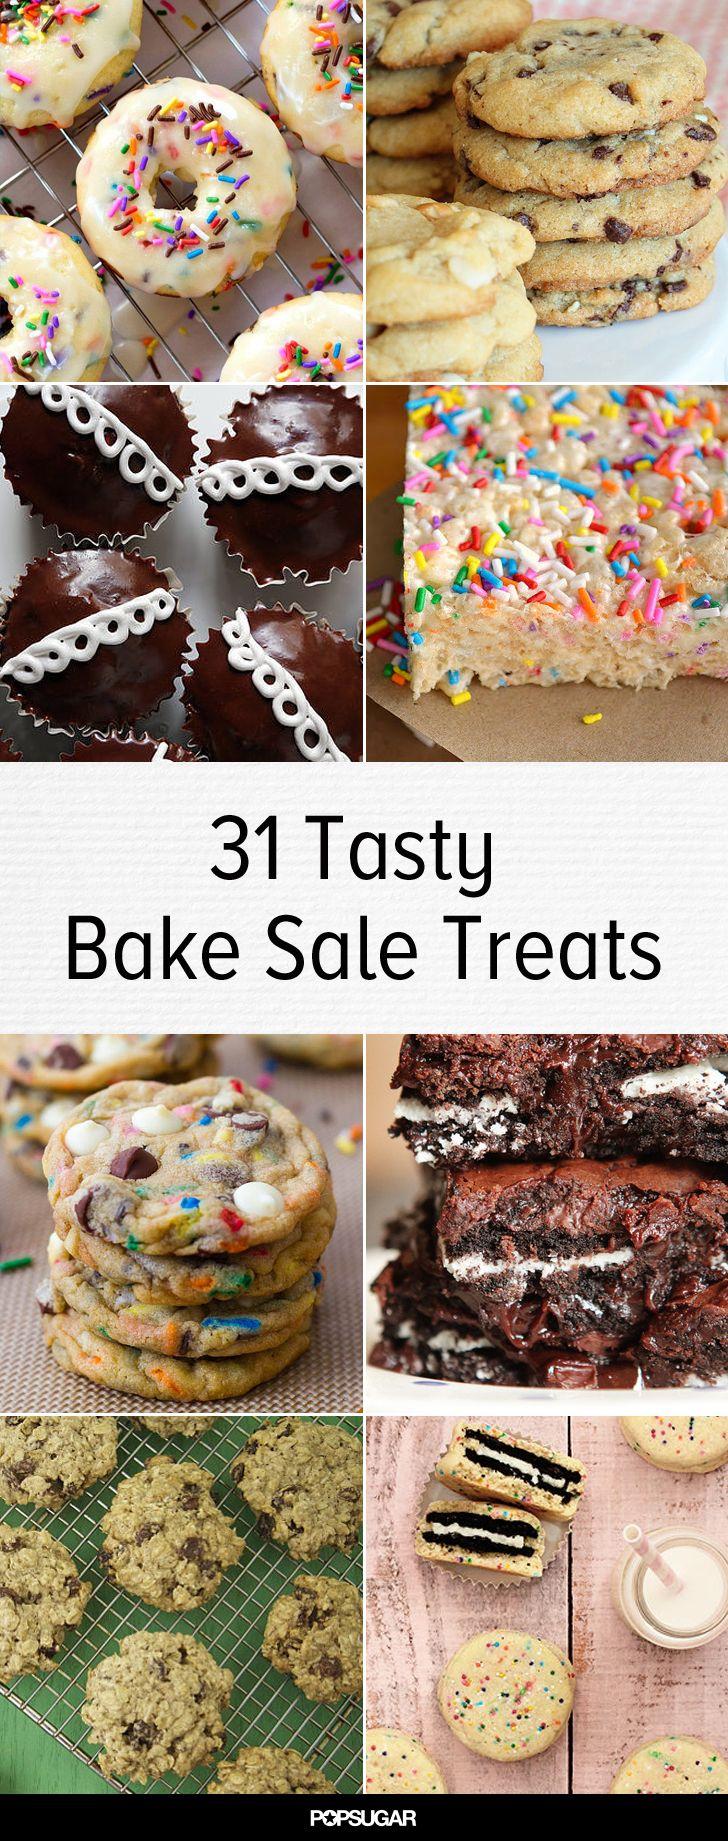 31 Ways to Nail the Next School Bake Sale